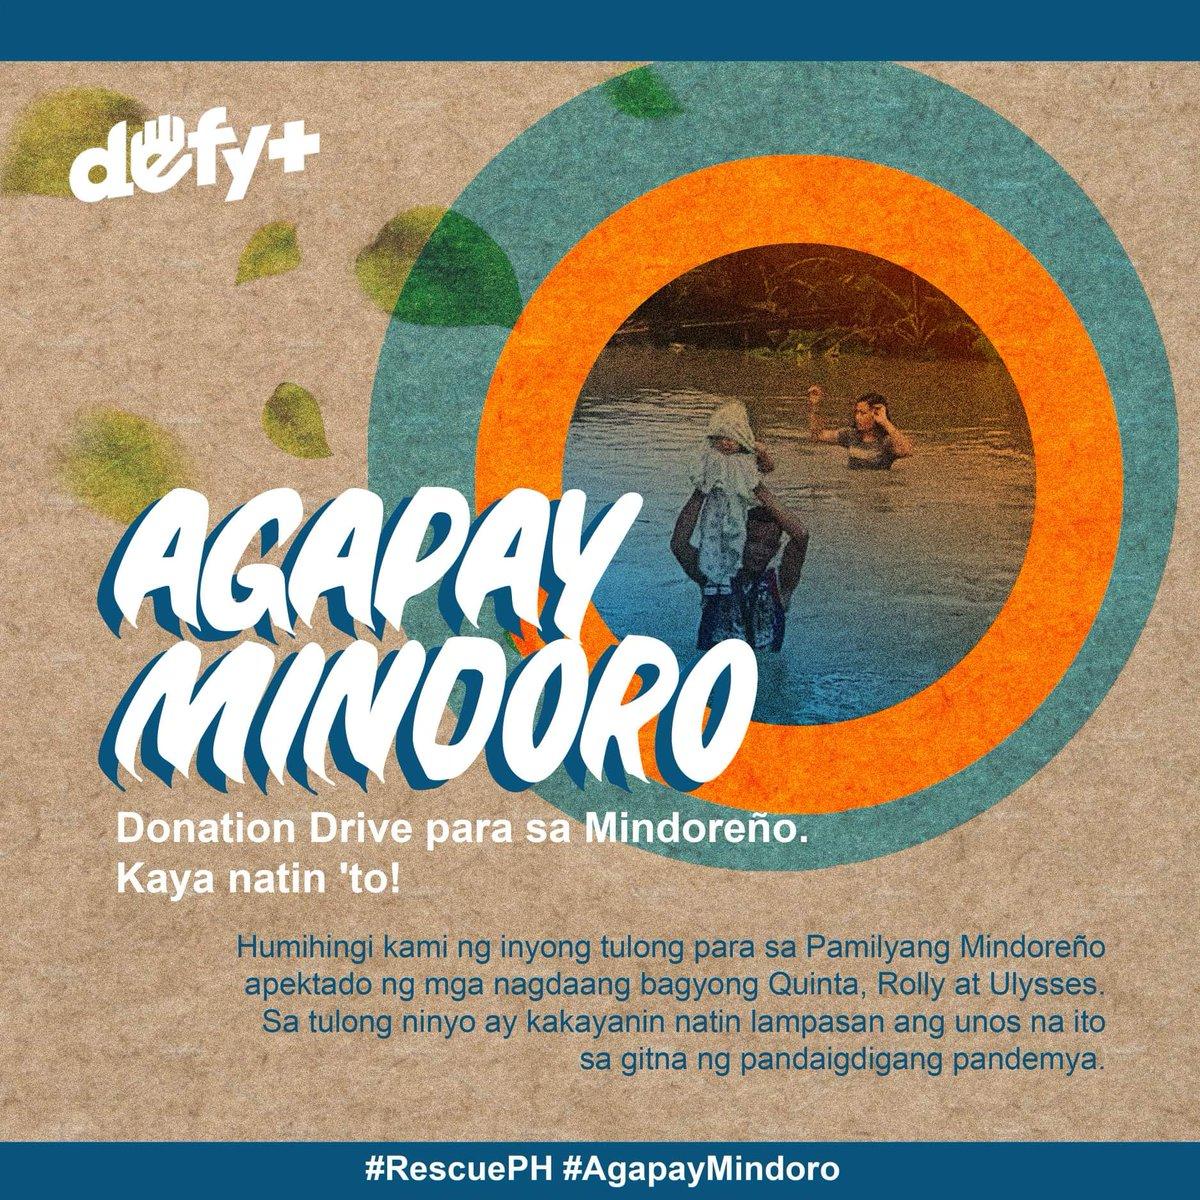 Last for today Agapay Mindoro